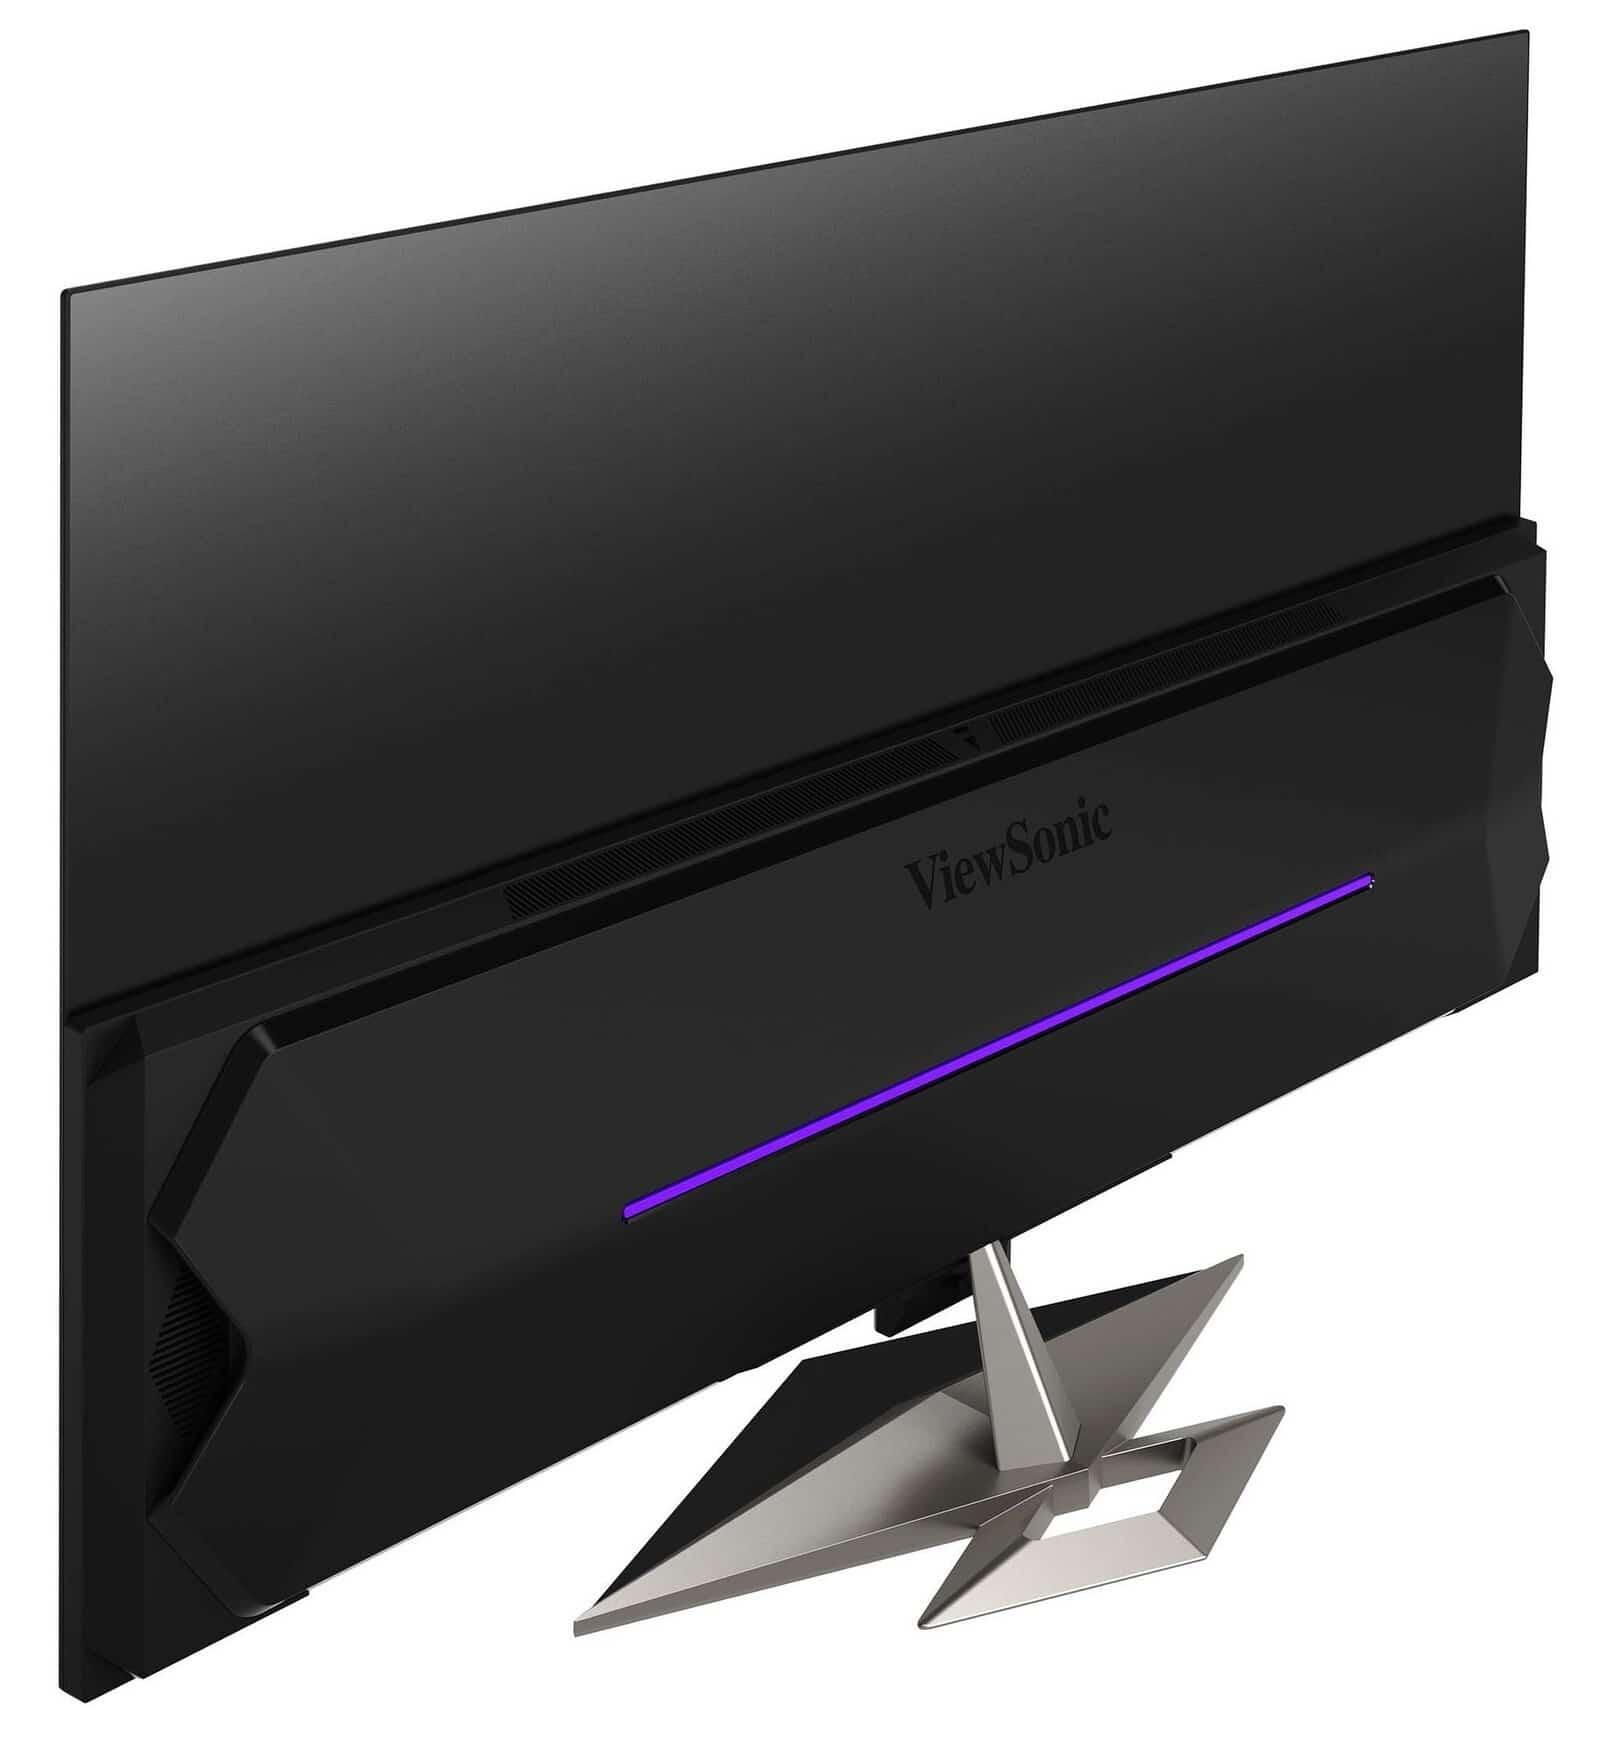 ecran Viewsonic XG550